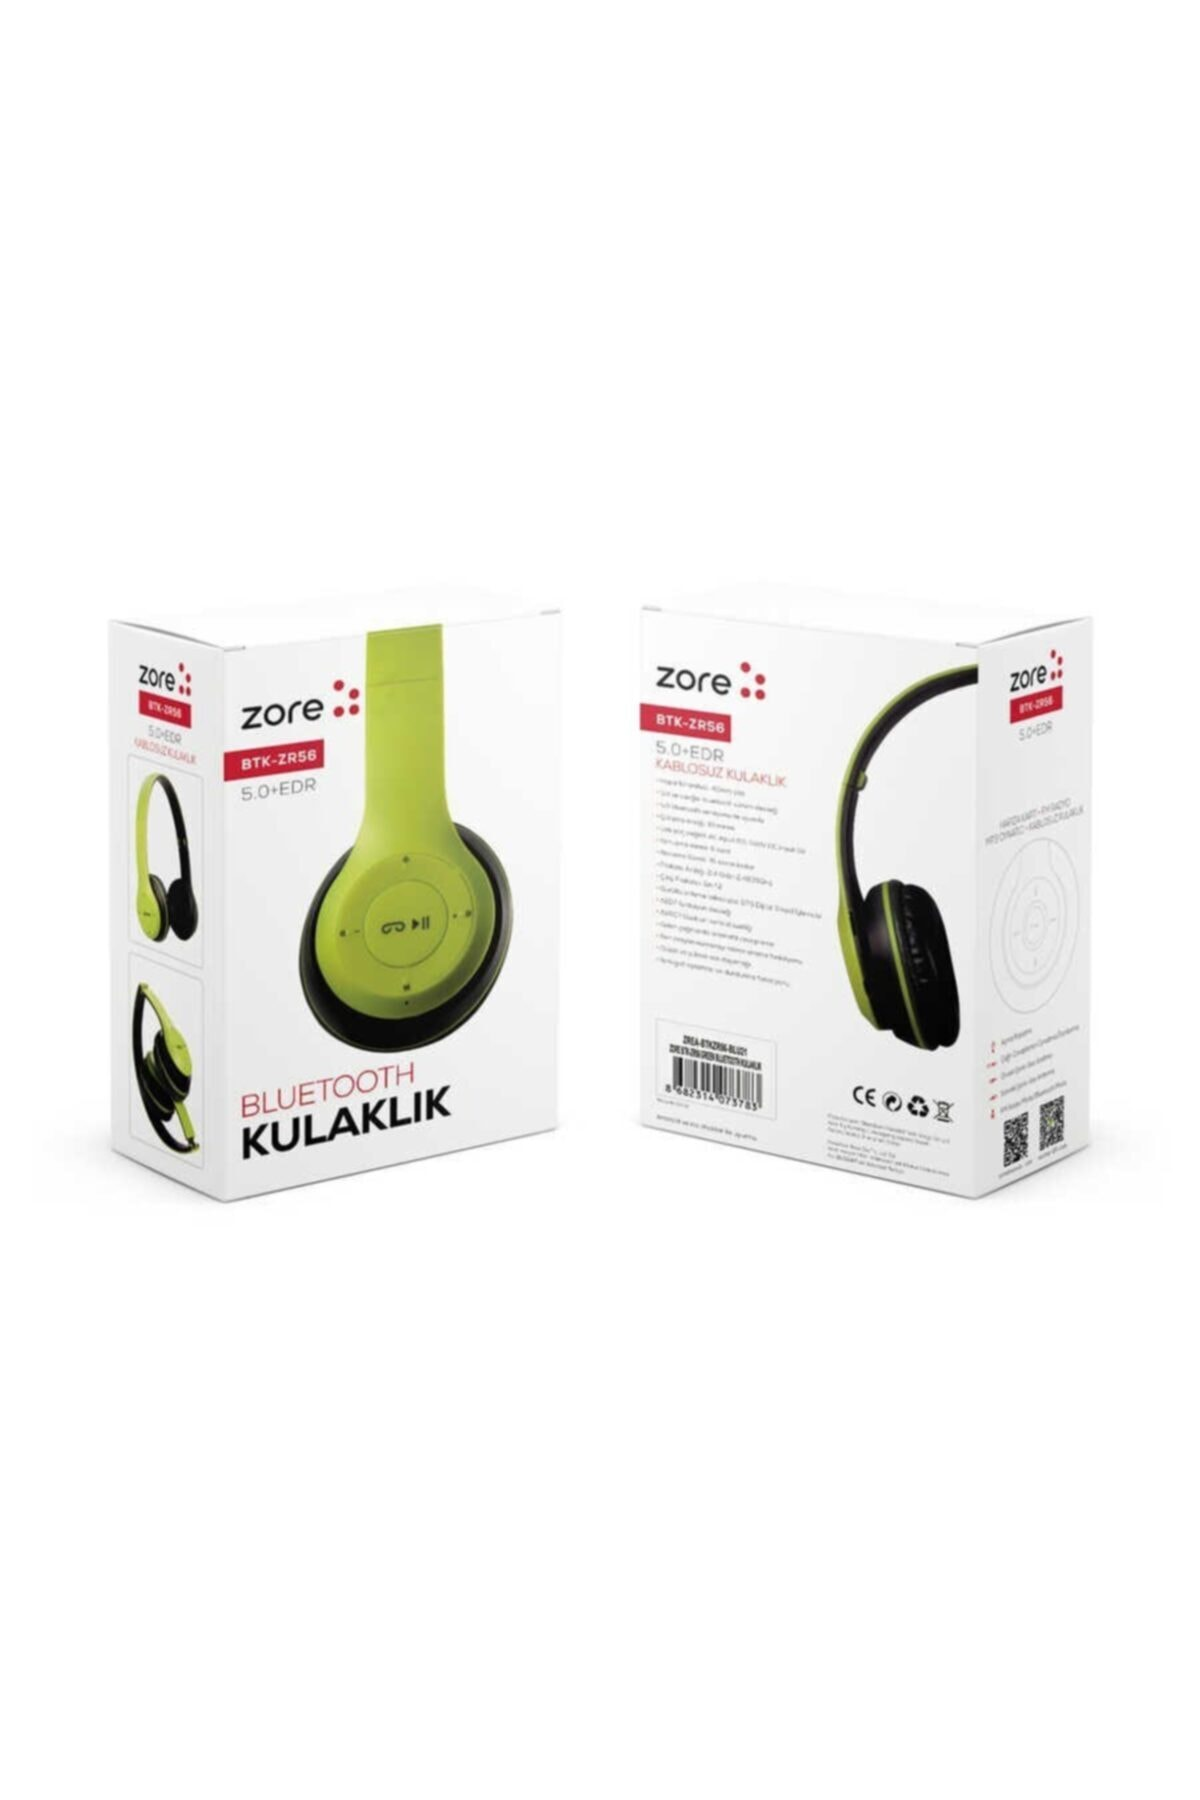 zore Btk-zr56 Uyumlu Bluetooth Kulaklık 2